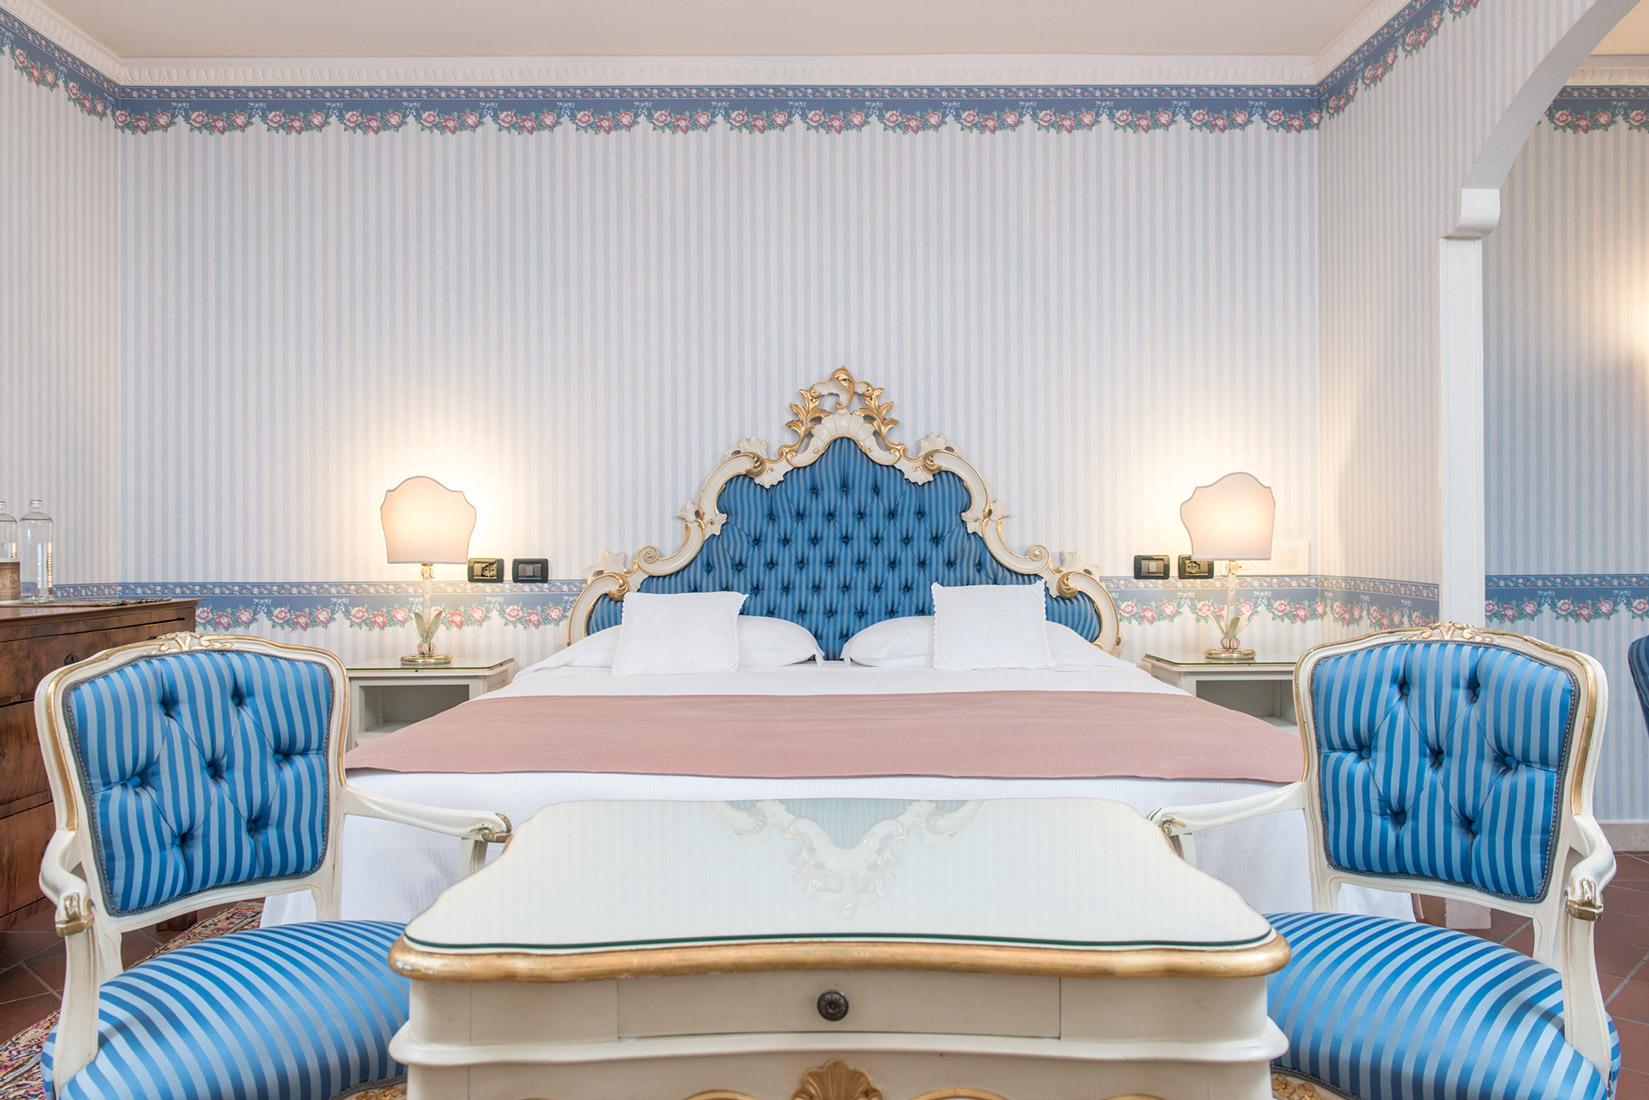 https://www.orlandinifrancesco.com/wp/wp-content/uploads/2019/01/Duchessa-Isabella-Ferrara-Camere-9.jpg